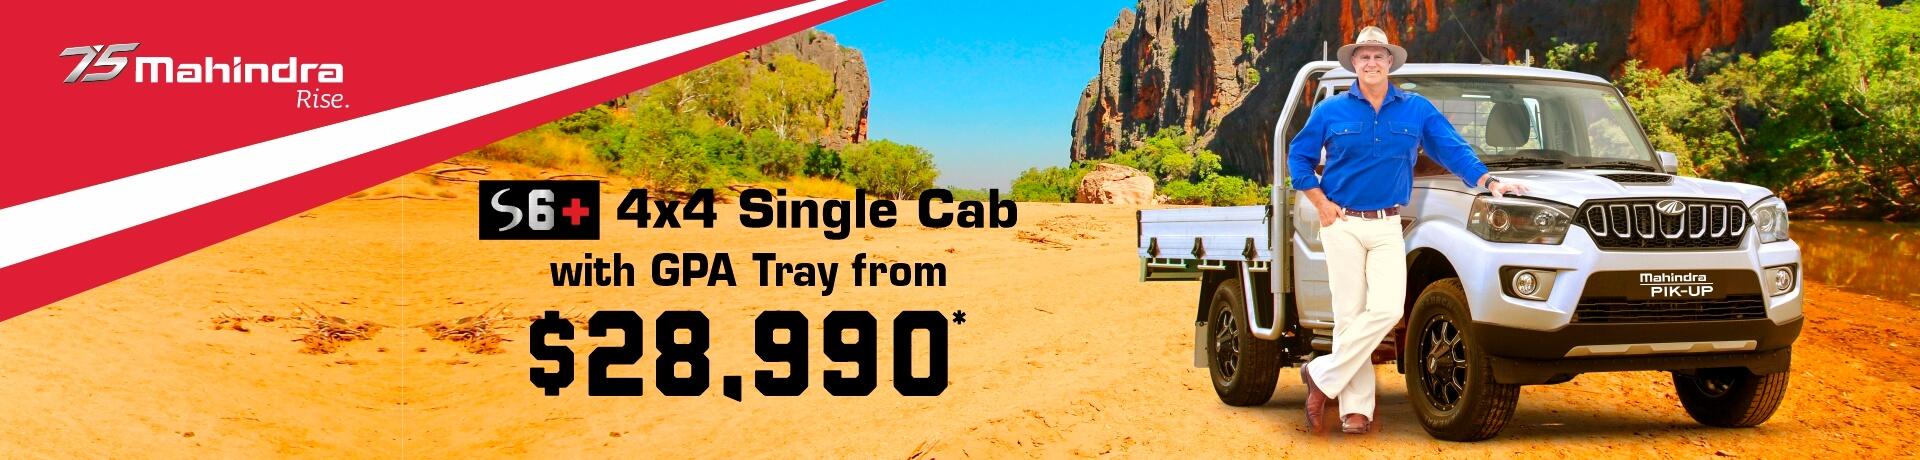 S6+ Single Cab 4x4.